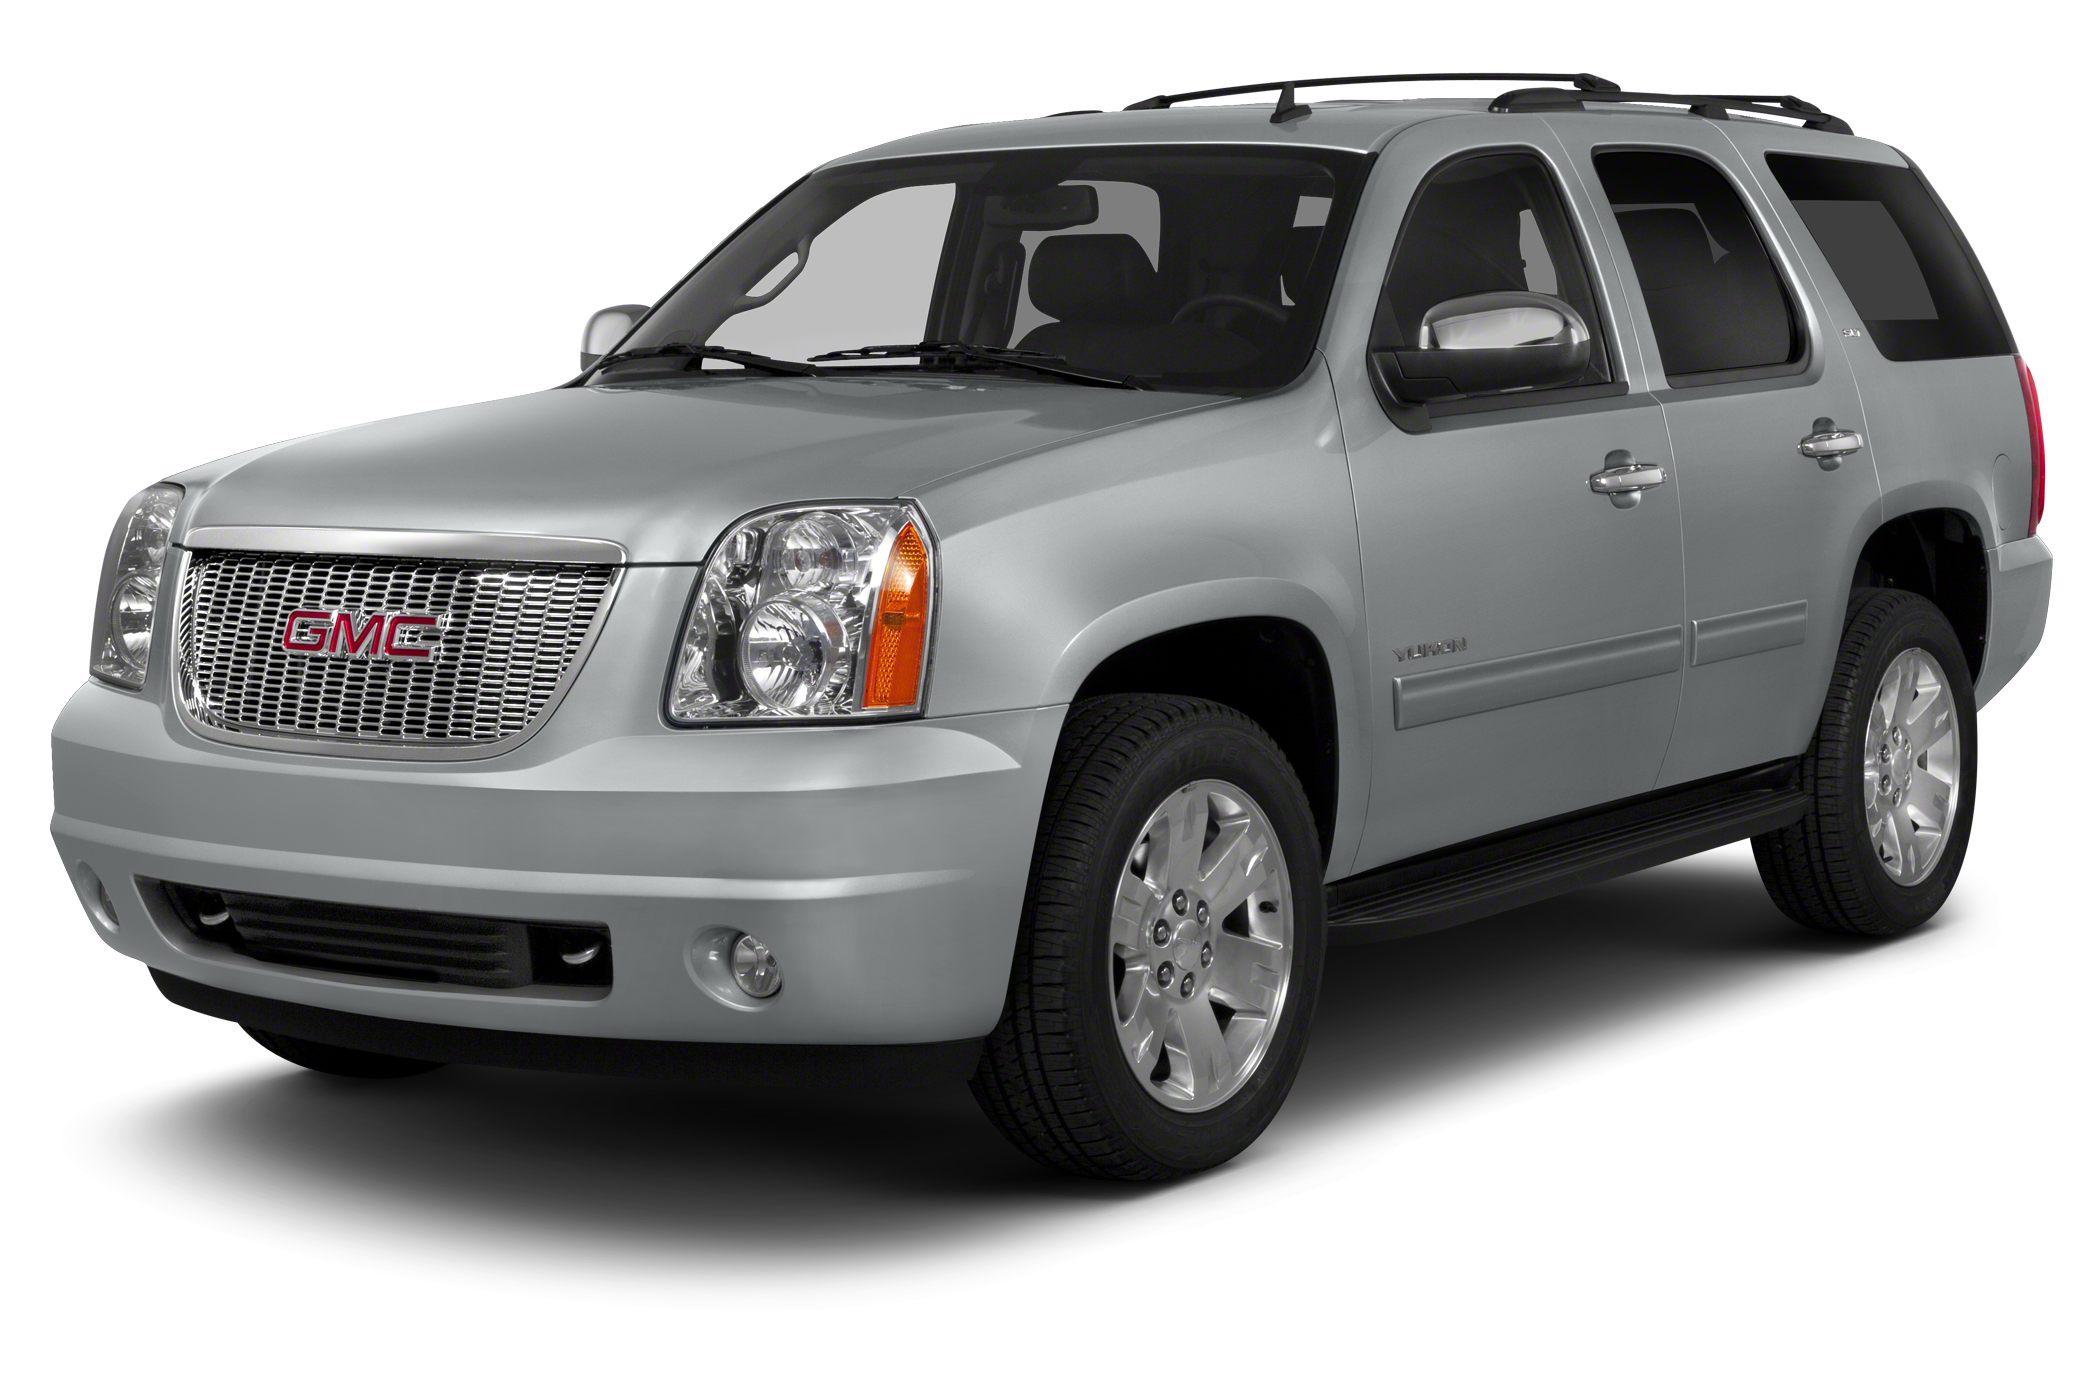 2013 GMC Yukon SLT Miles 86182Color UNSPECIFIED Stock 1GKS2CE08DR254302 VIN 1GKS2CE08DR25430